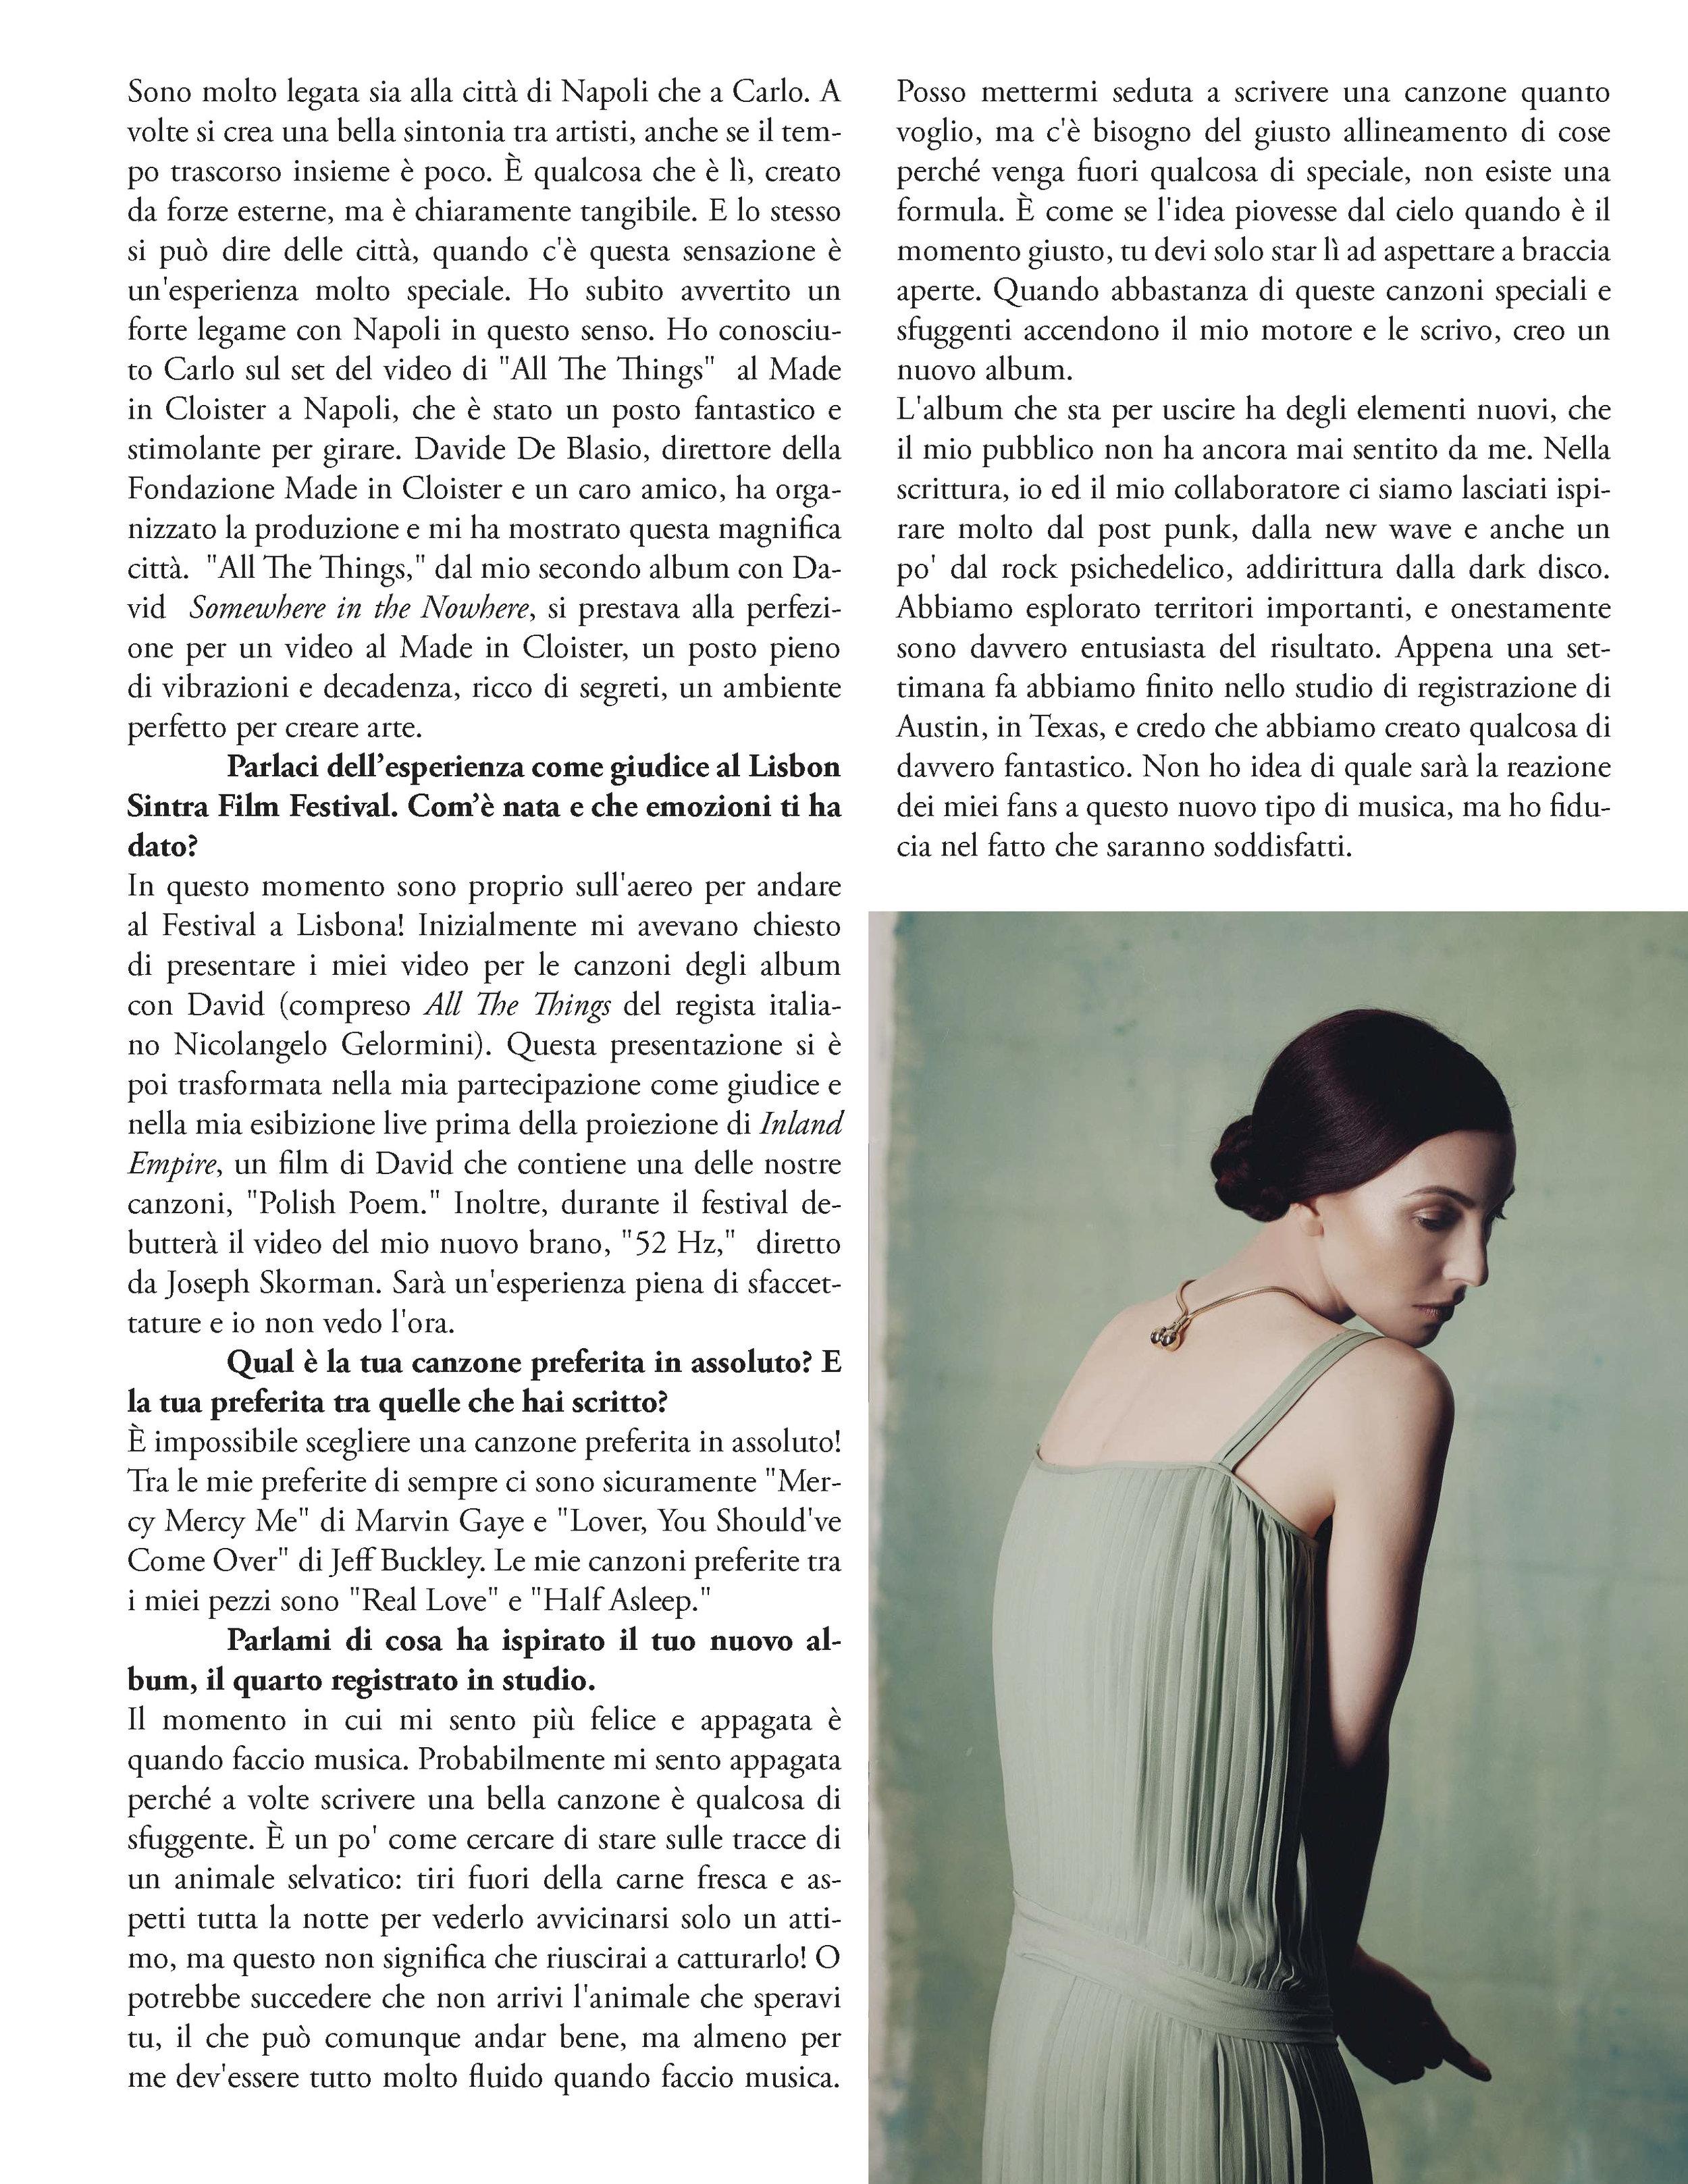 DesnudoMagazineItaliaIssue1ChrystaBellCover_Pagina_113.jpg